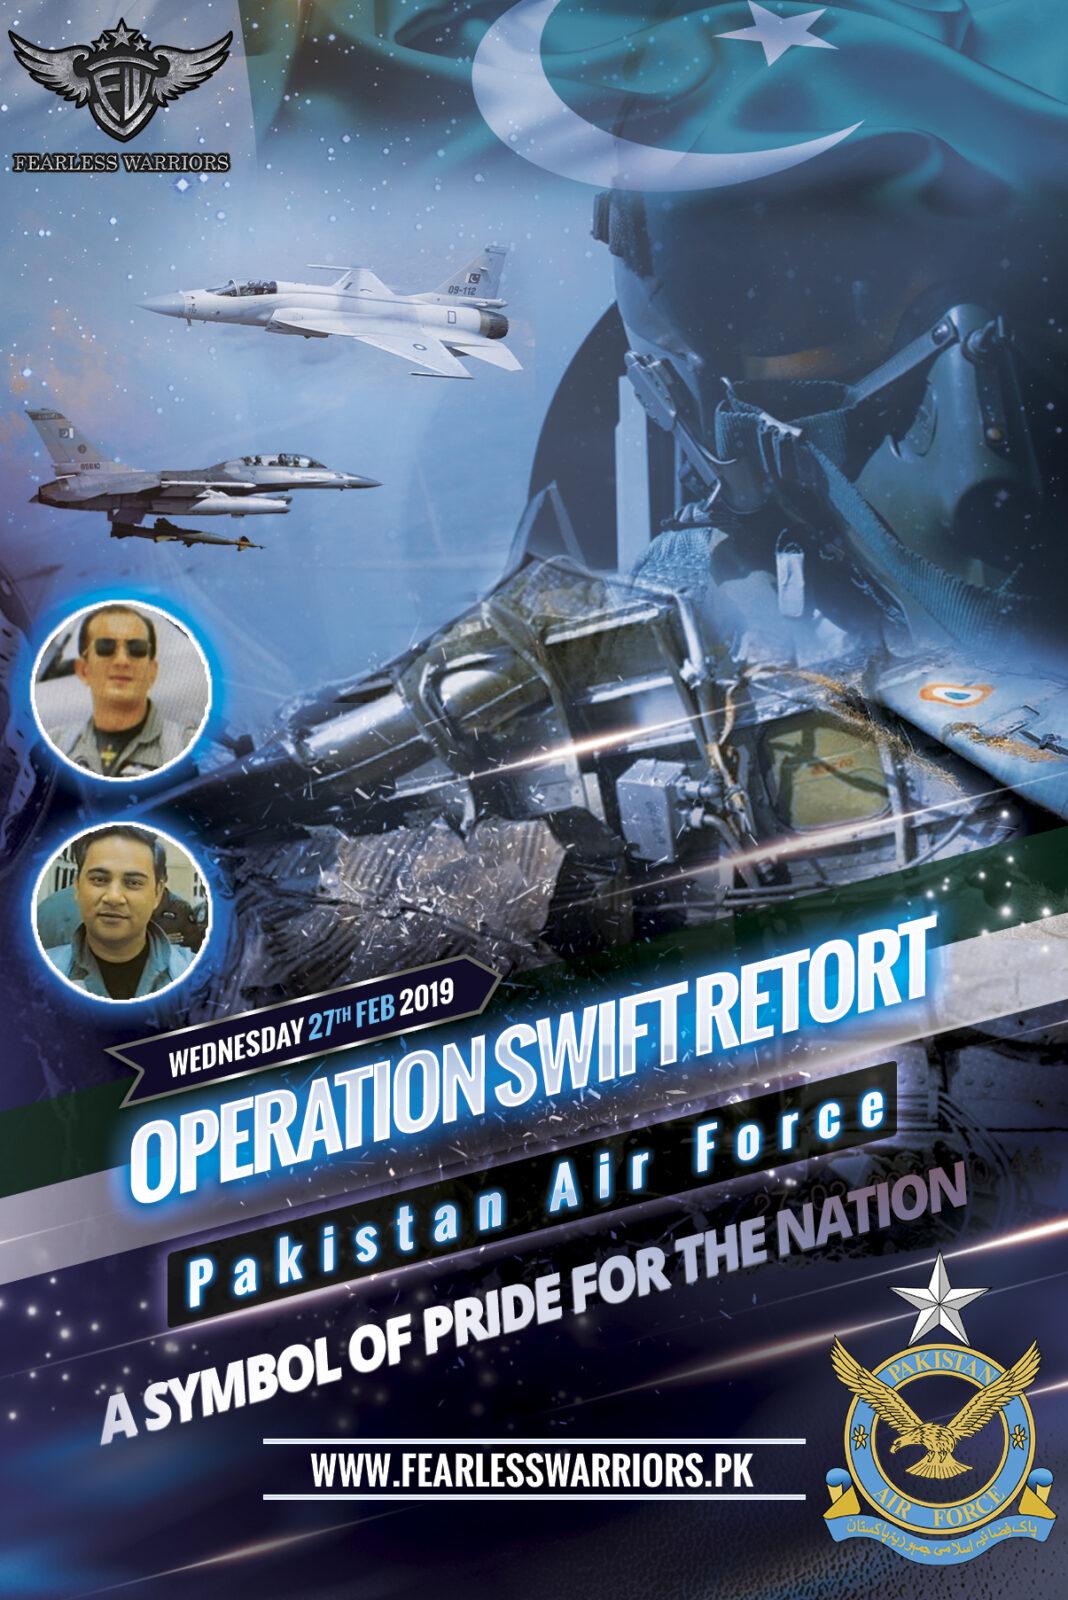 Operation Swift Retort - Feb 27th 2019 - Pakistan Air Force - FearlessWarriors.PK